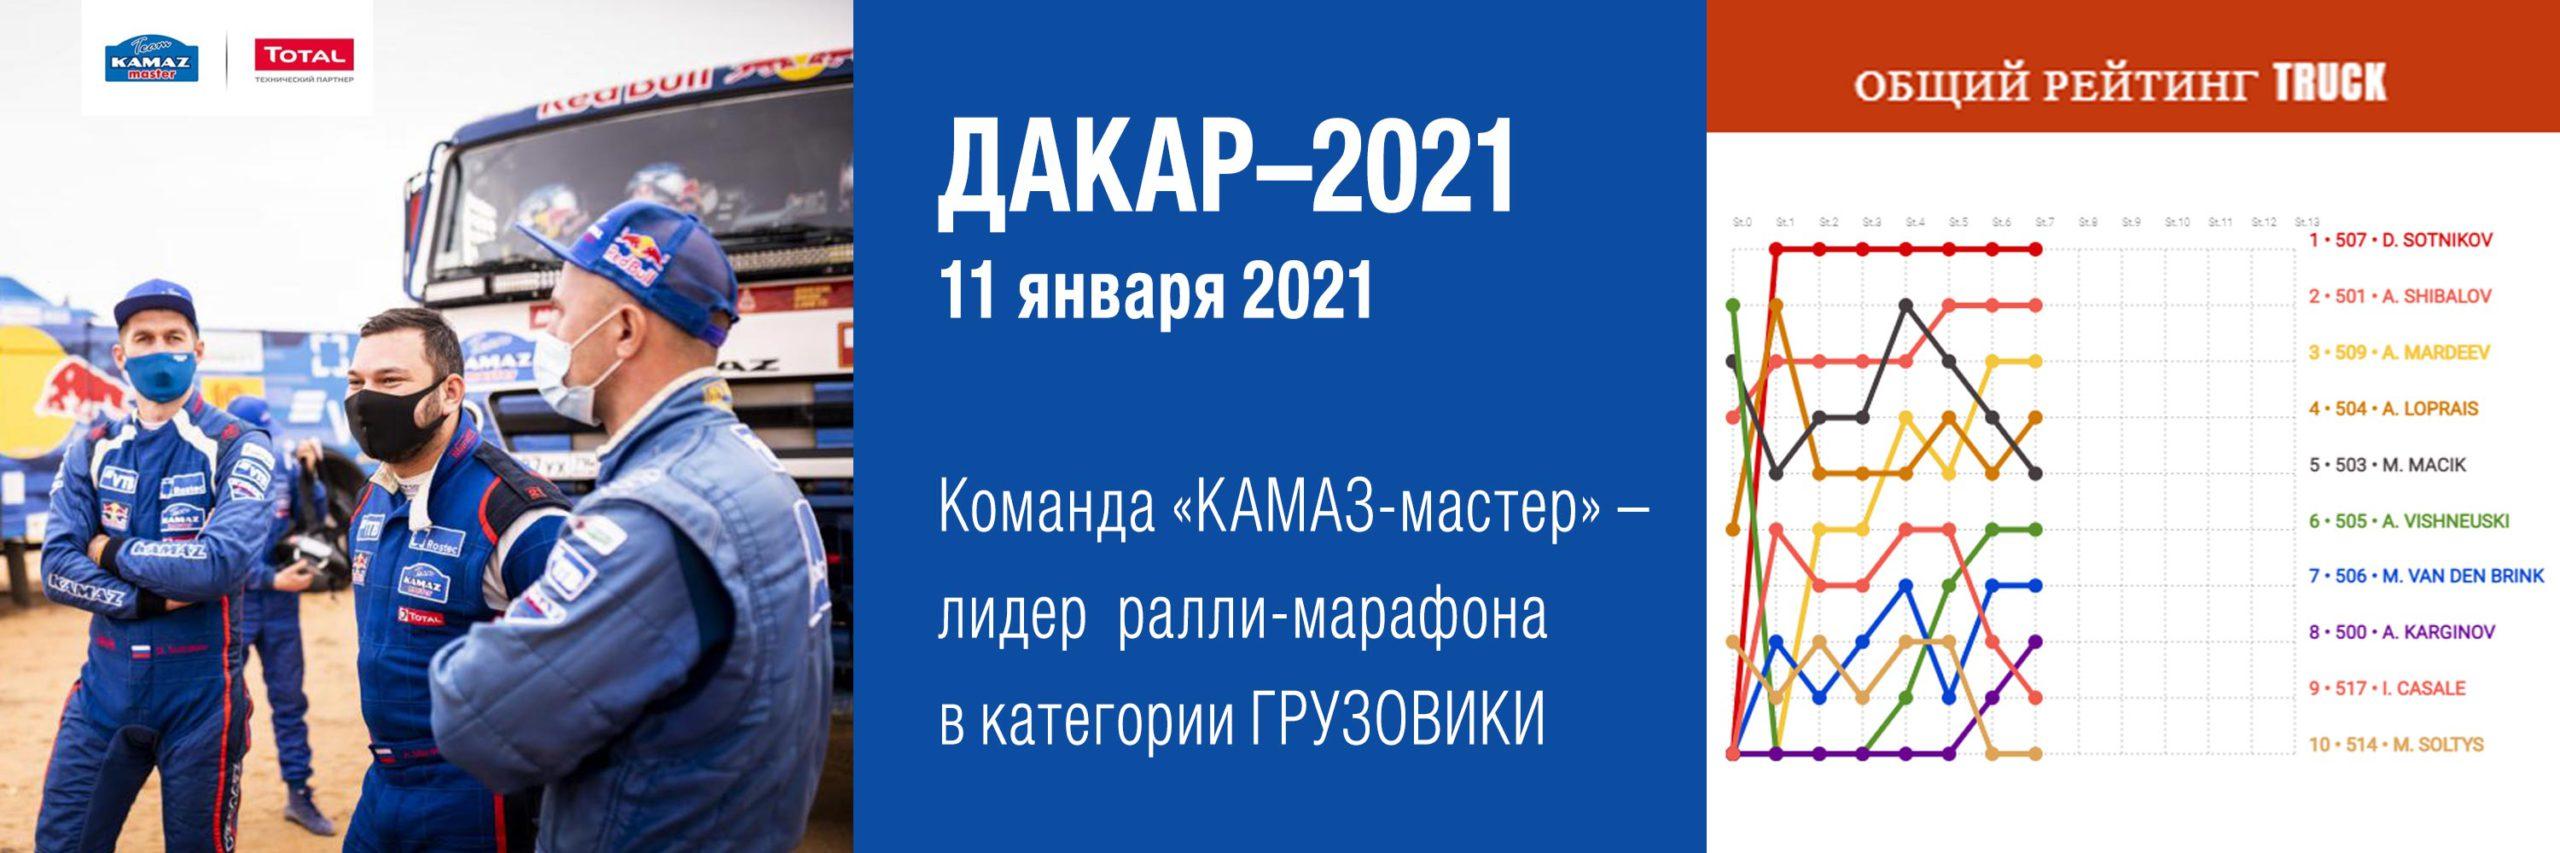 DAKAR-2021 - КАМАЗ-мастер - TOTAL